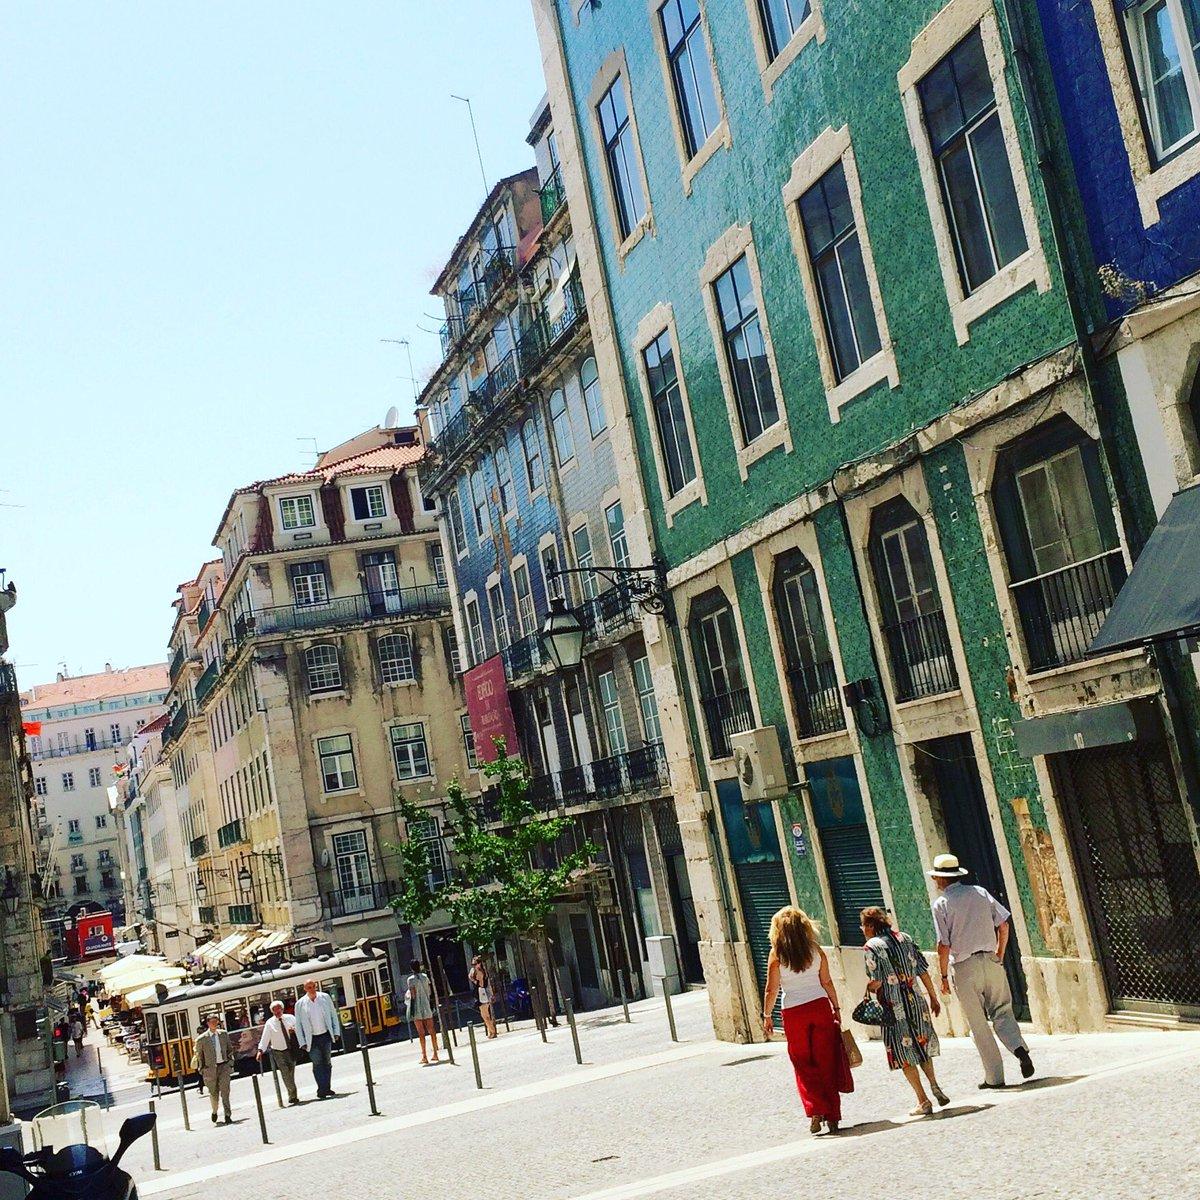 Lisboa, menina e moça, de passagem. #TravelTuesday #amreading #amwriting https://t.co/3JUXZCKhgz